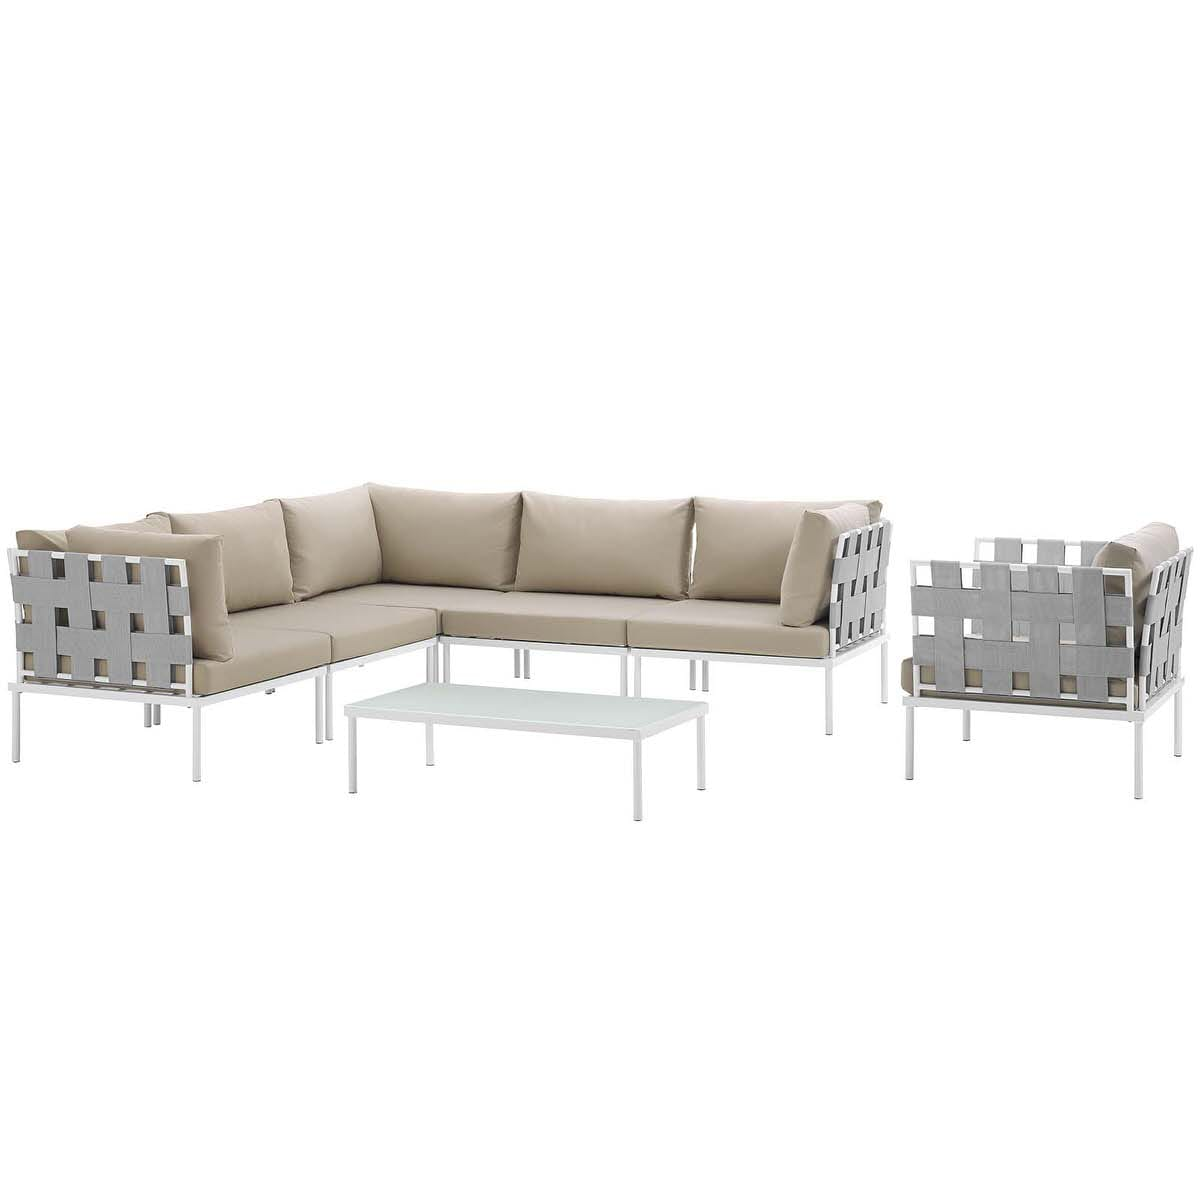 Harmony 7 Piece Outdoor Patio Aluminum Sectional Sofa Set ...